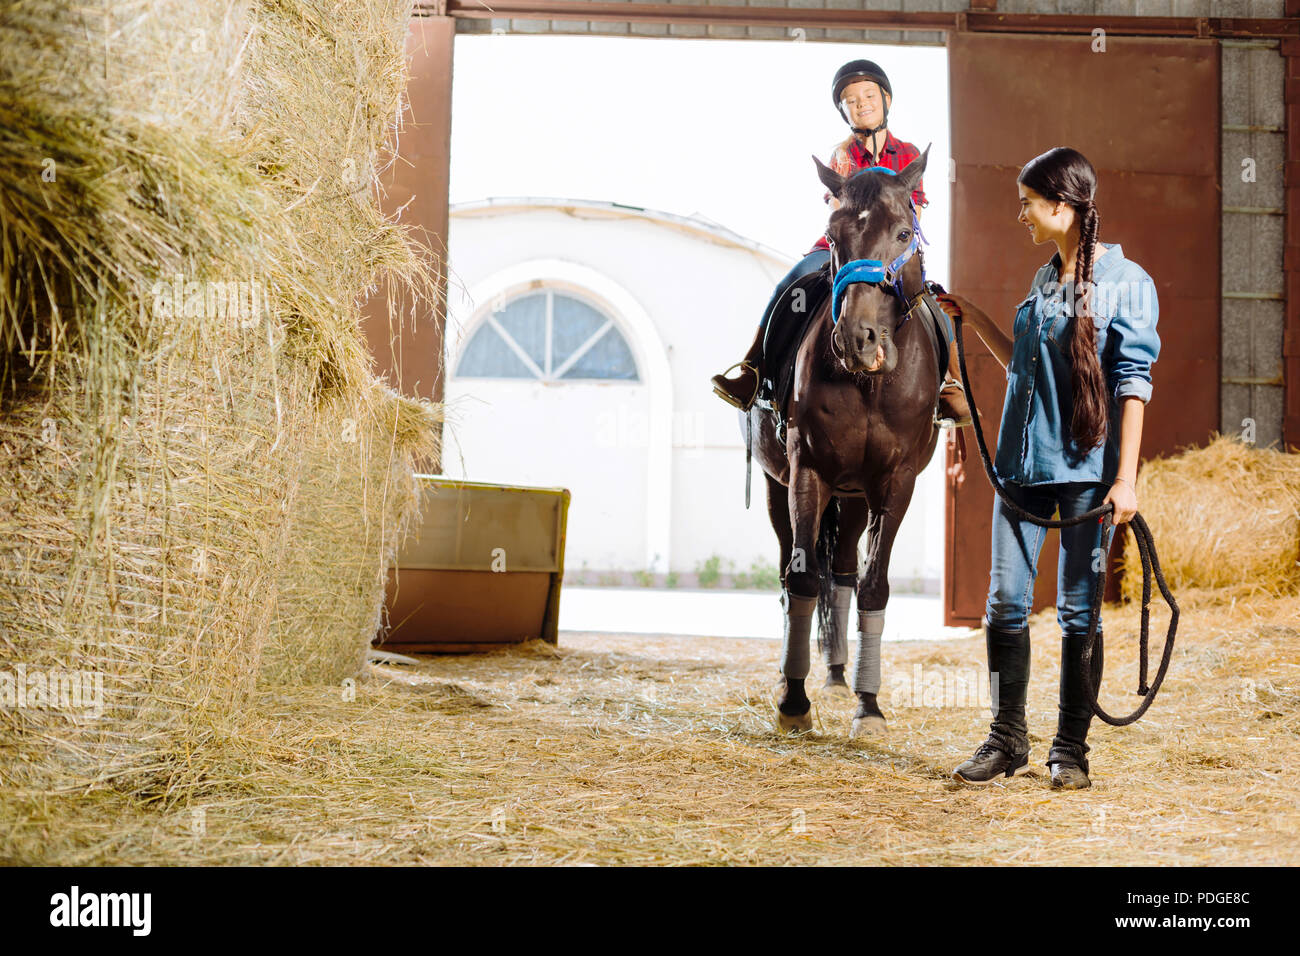 Horsewoman teaching her daughter riding racing horse - Stock Image